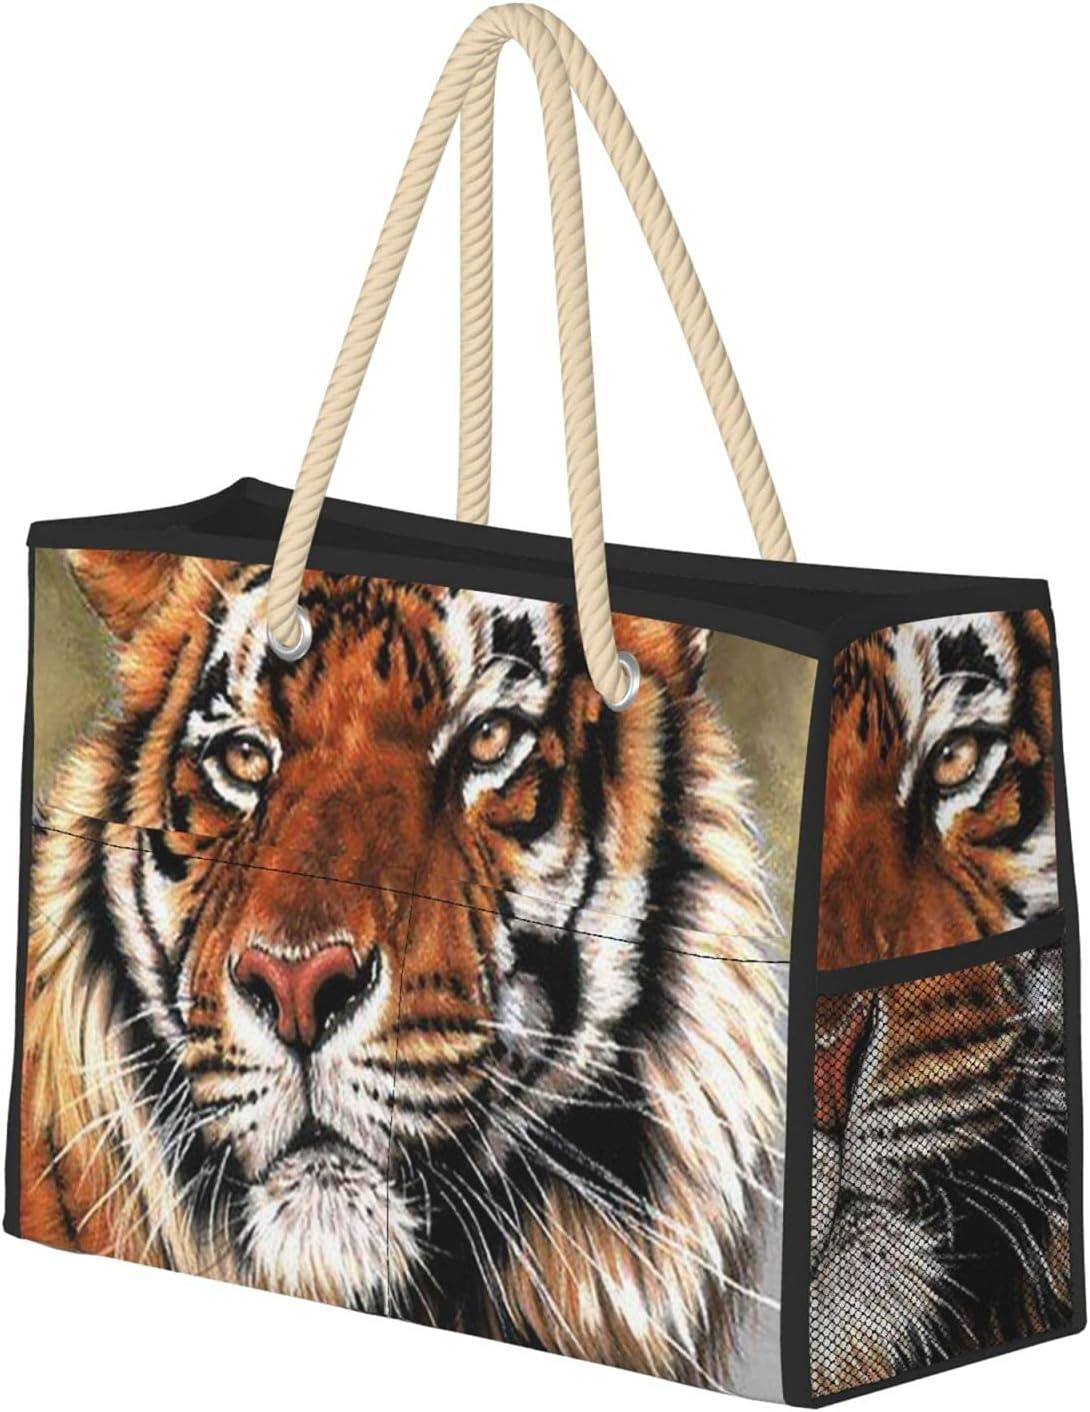 Cute Tiger Beach Bag - Zipper Max 50% OFF Lightweight 67% OFF of fixed price Top Closure Tote